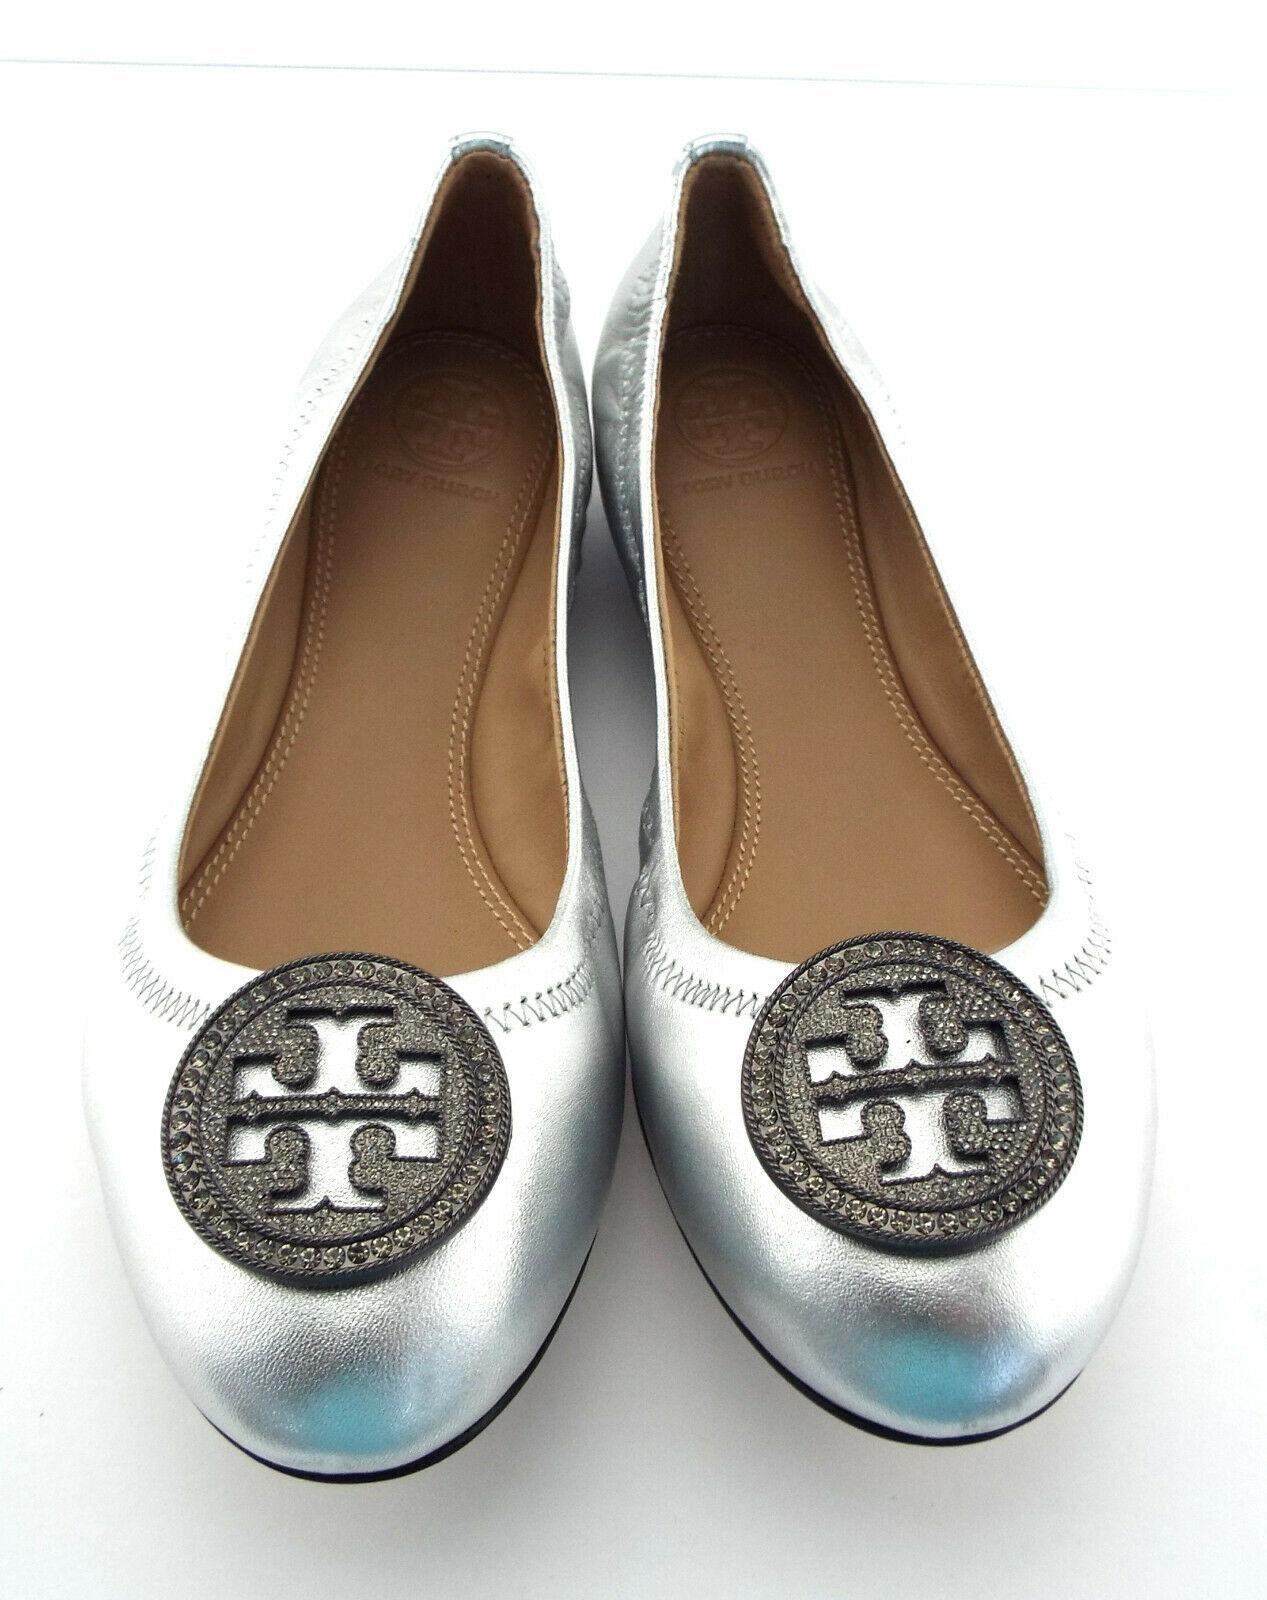 New TORY BURCH Size 7 LIANA Silver Metallic Ballet Flats Shoes